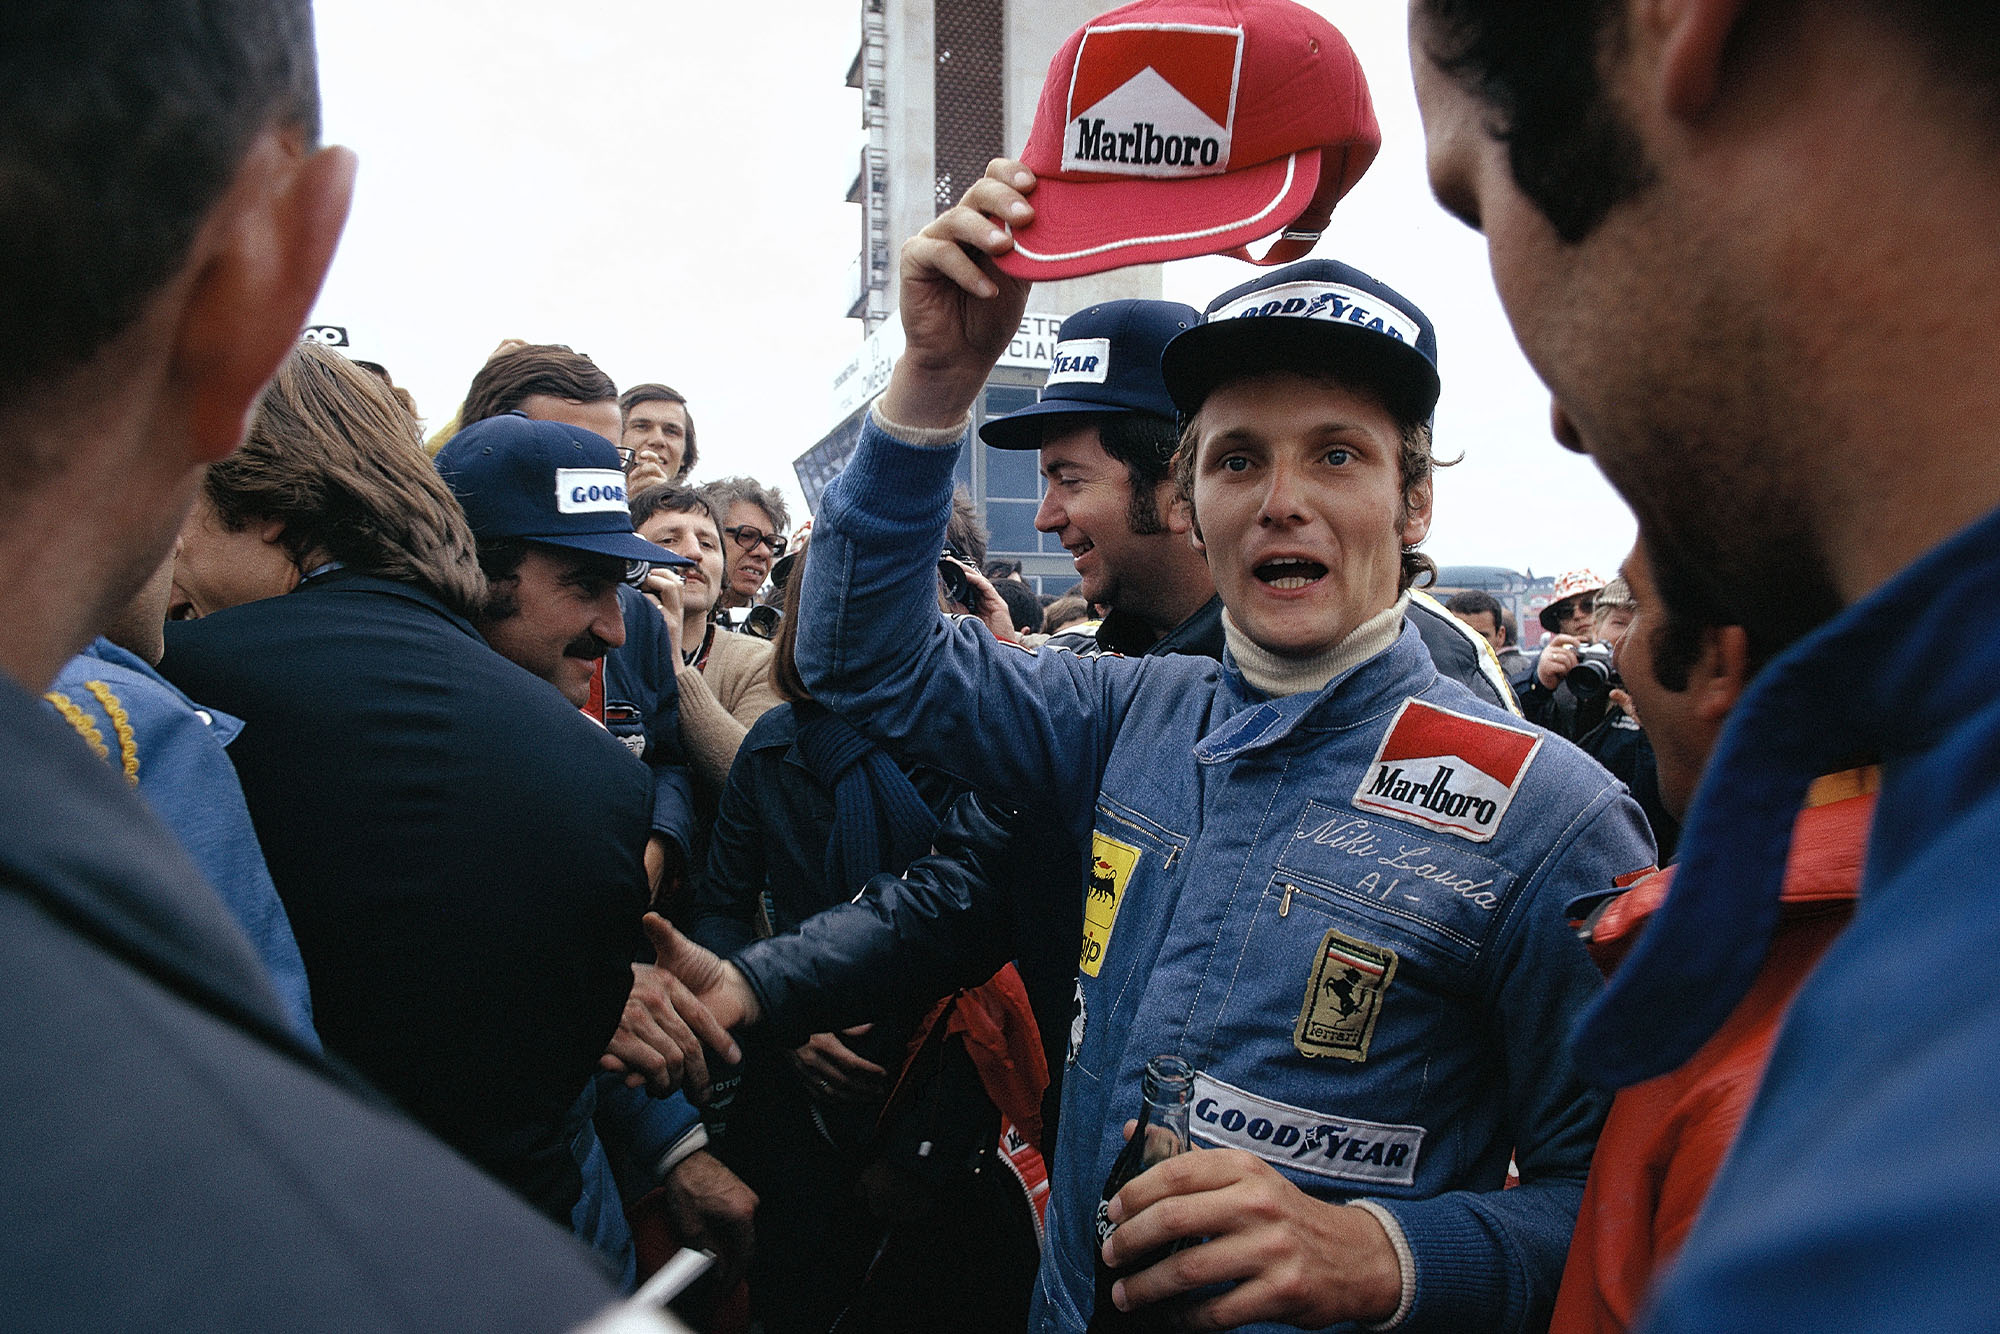 Niki Lauda (Ferrari) celebrates winning the 1974 Spanish Grand Prix